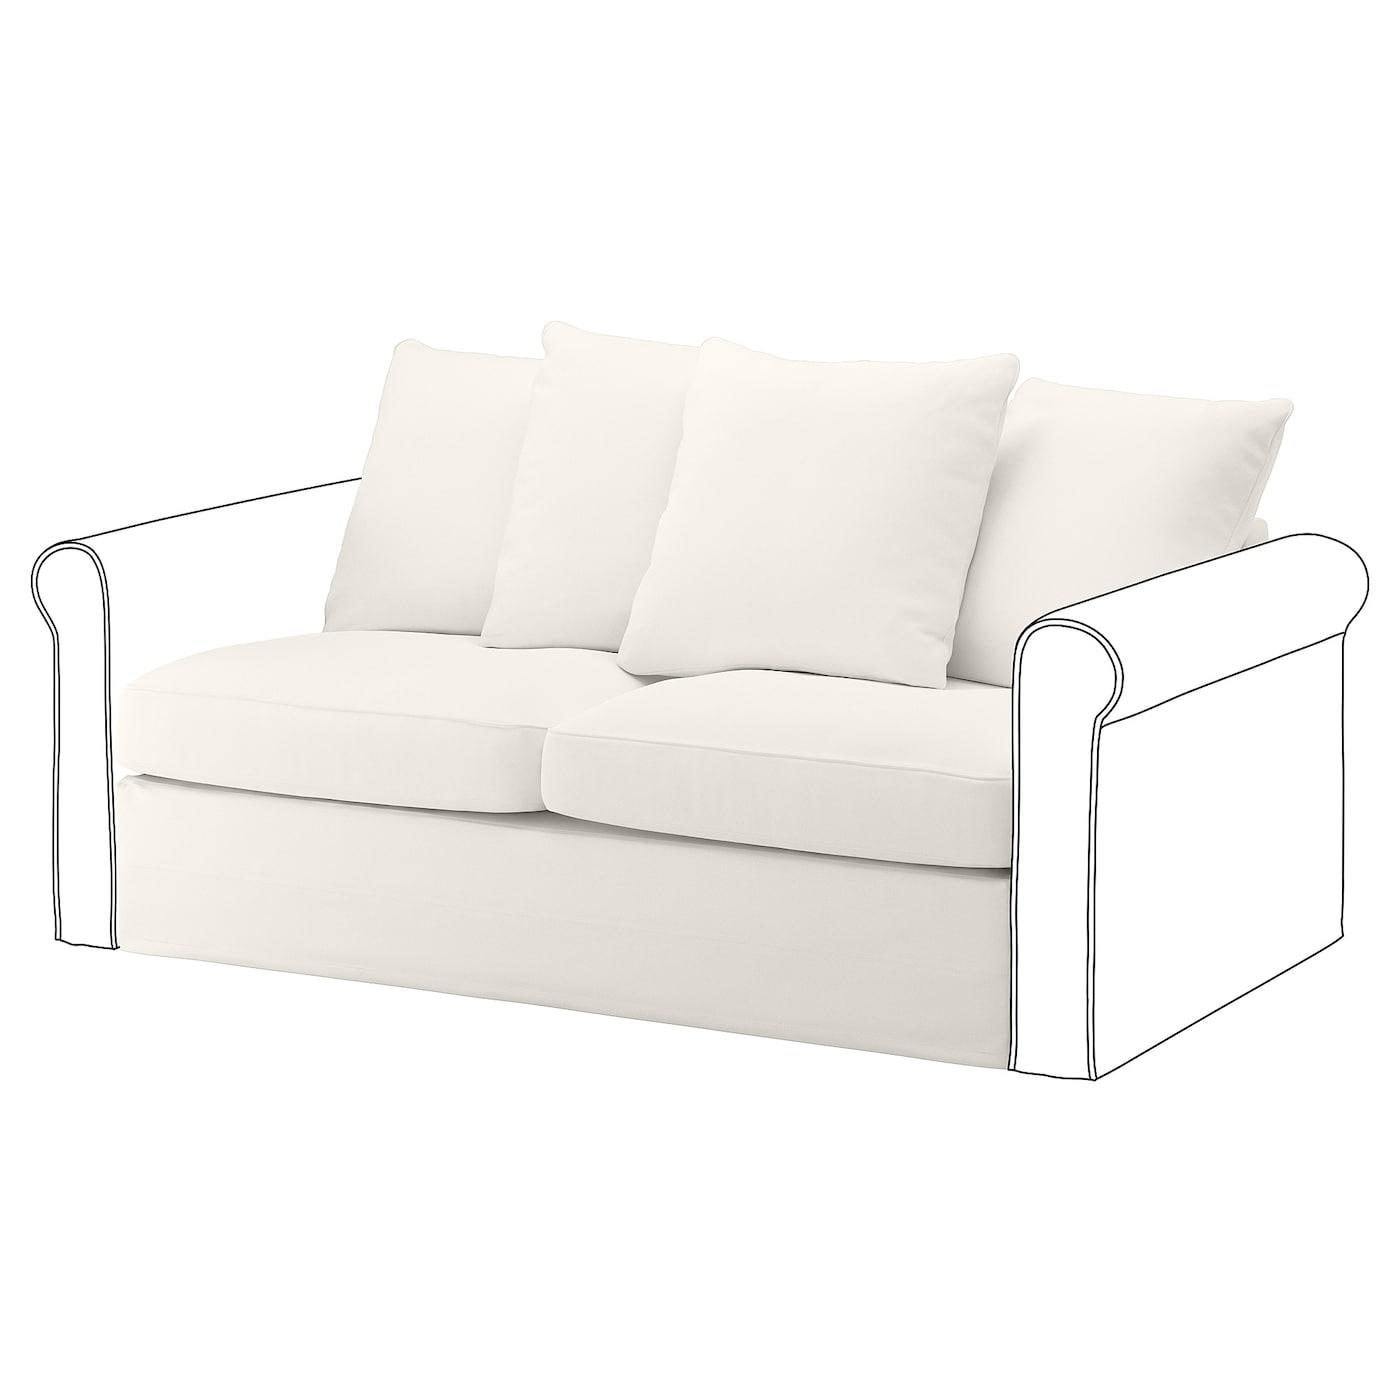 Gronlid Loveseat Sleeper Section Inseros White